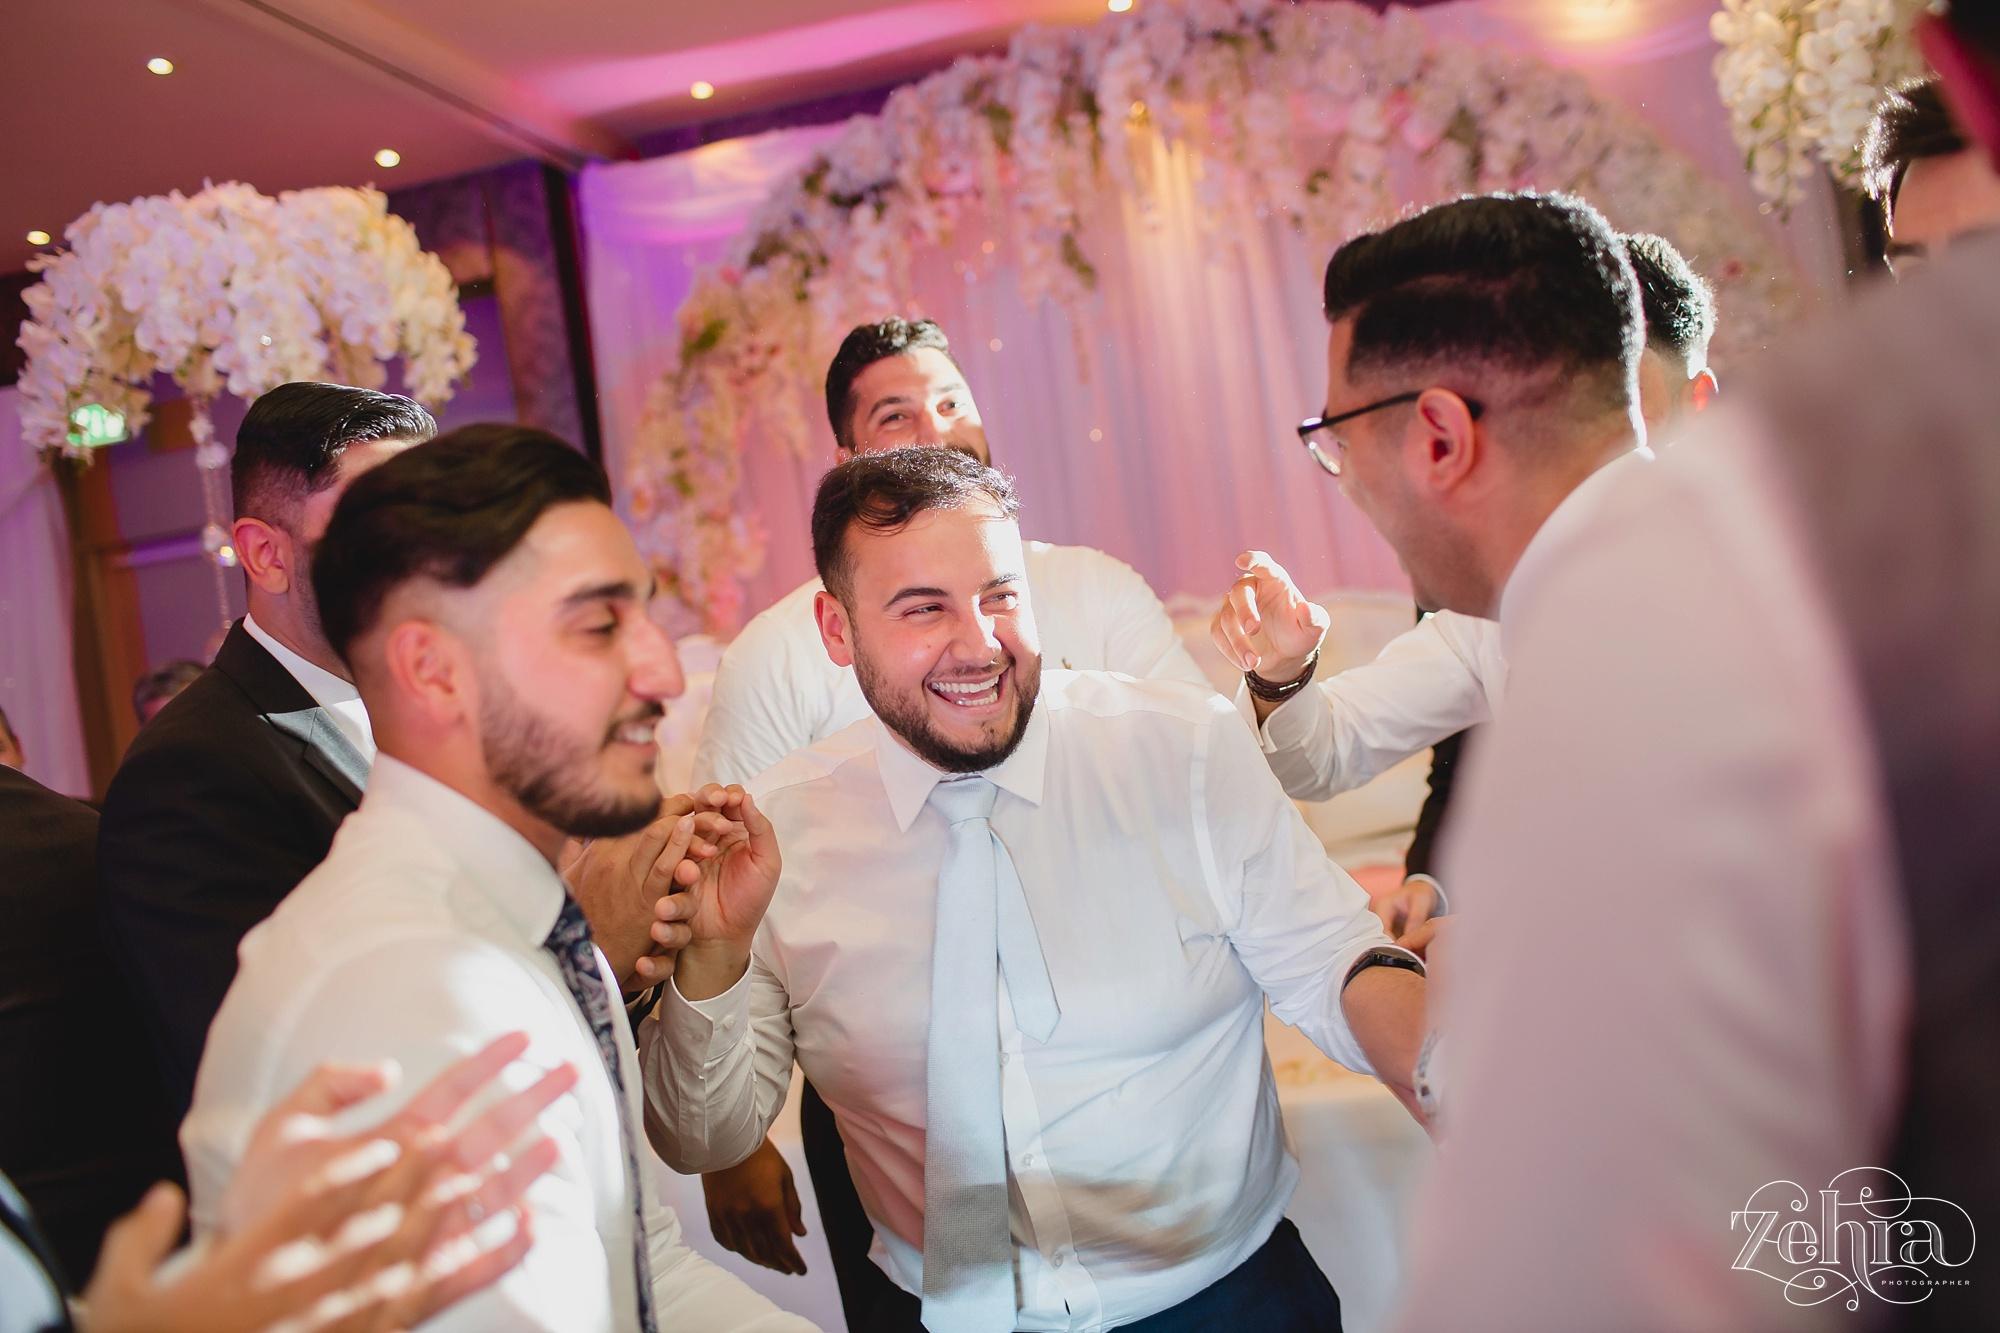 zehra photographer mere cheshire wedding_0051.jpg